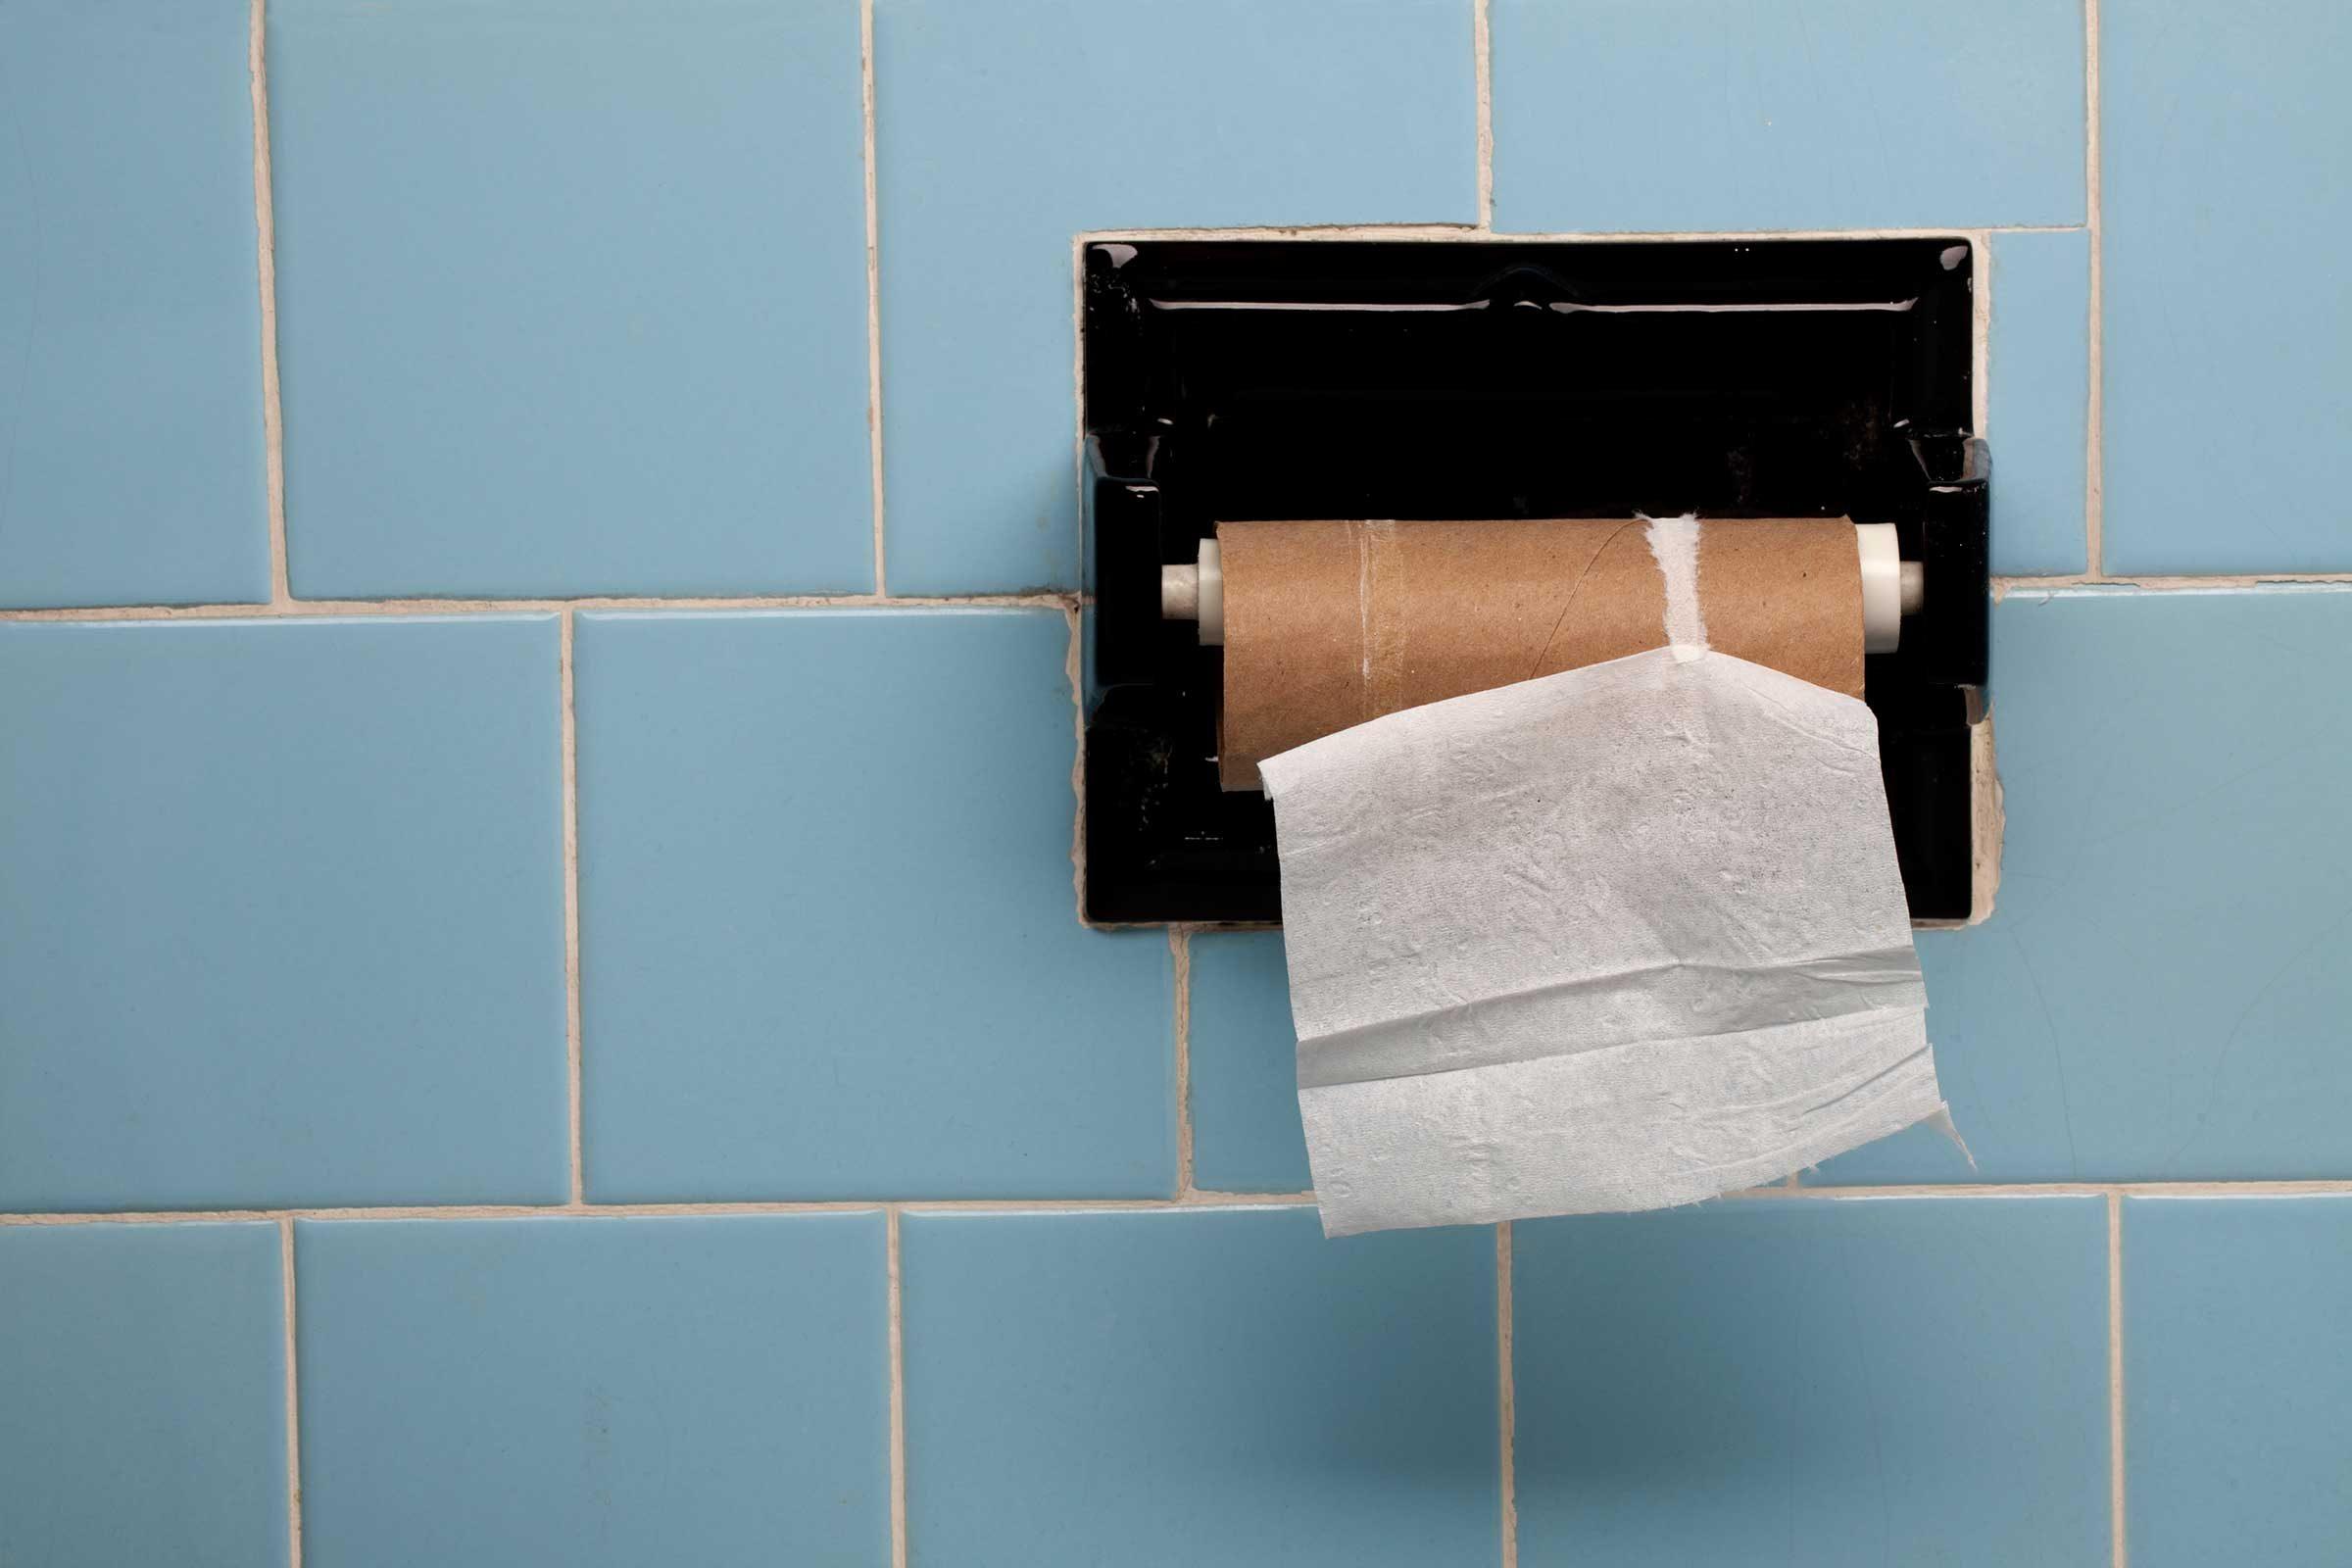 Black Toilet Bowl